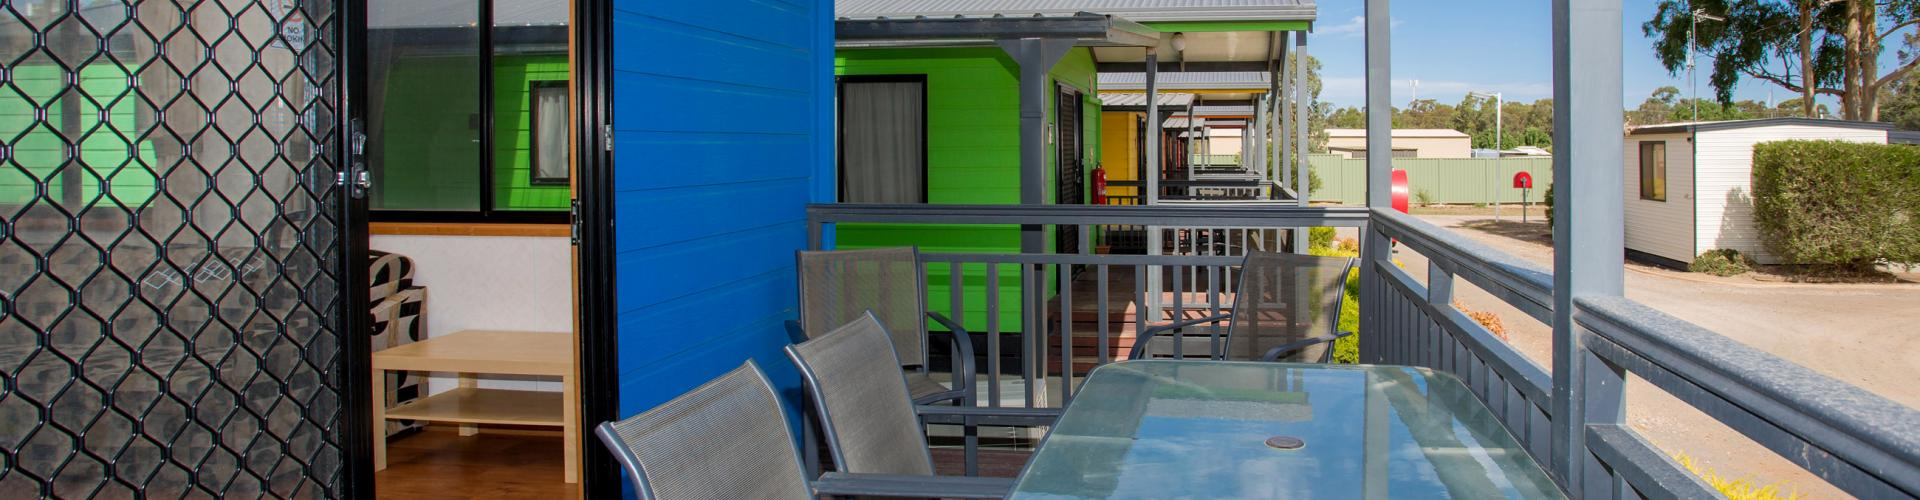 BIG4 Bendigo Park Lane Holiday Park - 2 Bedroom Villa Veranda